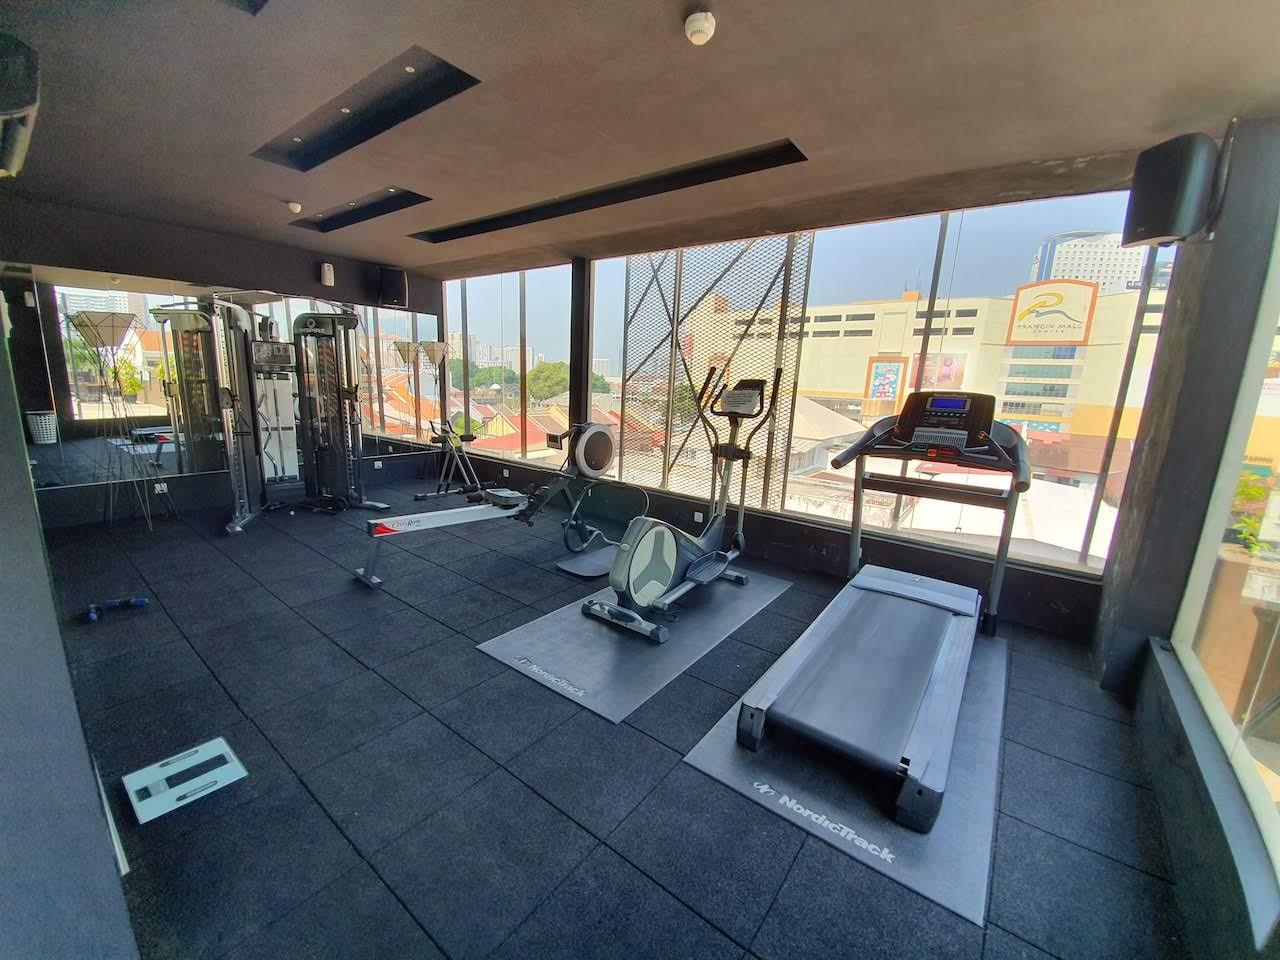 A free gym